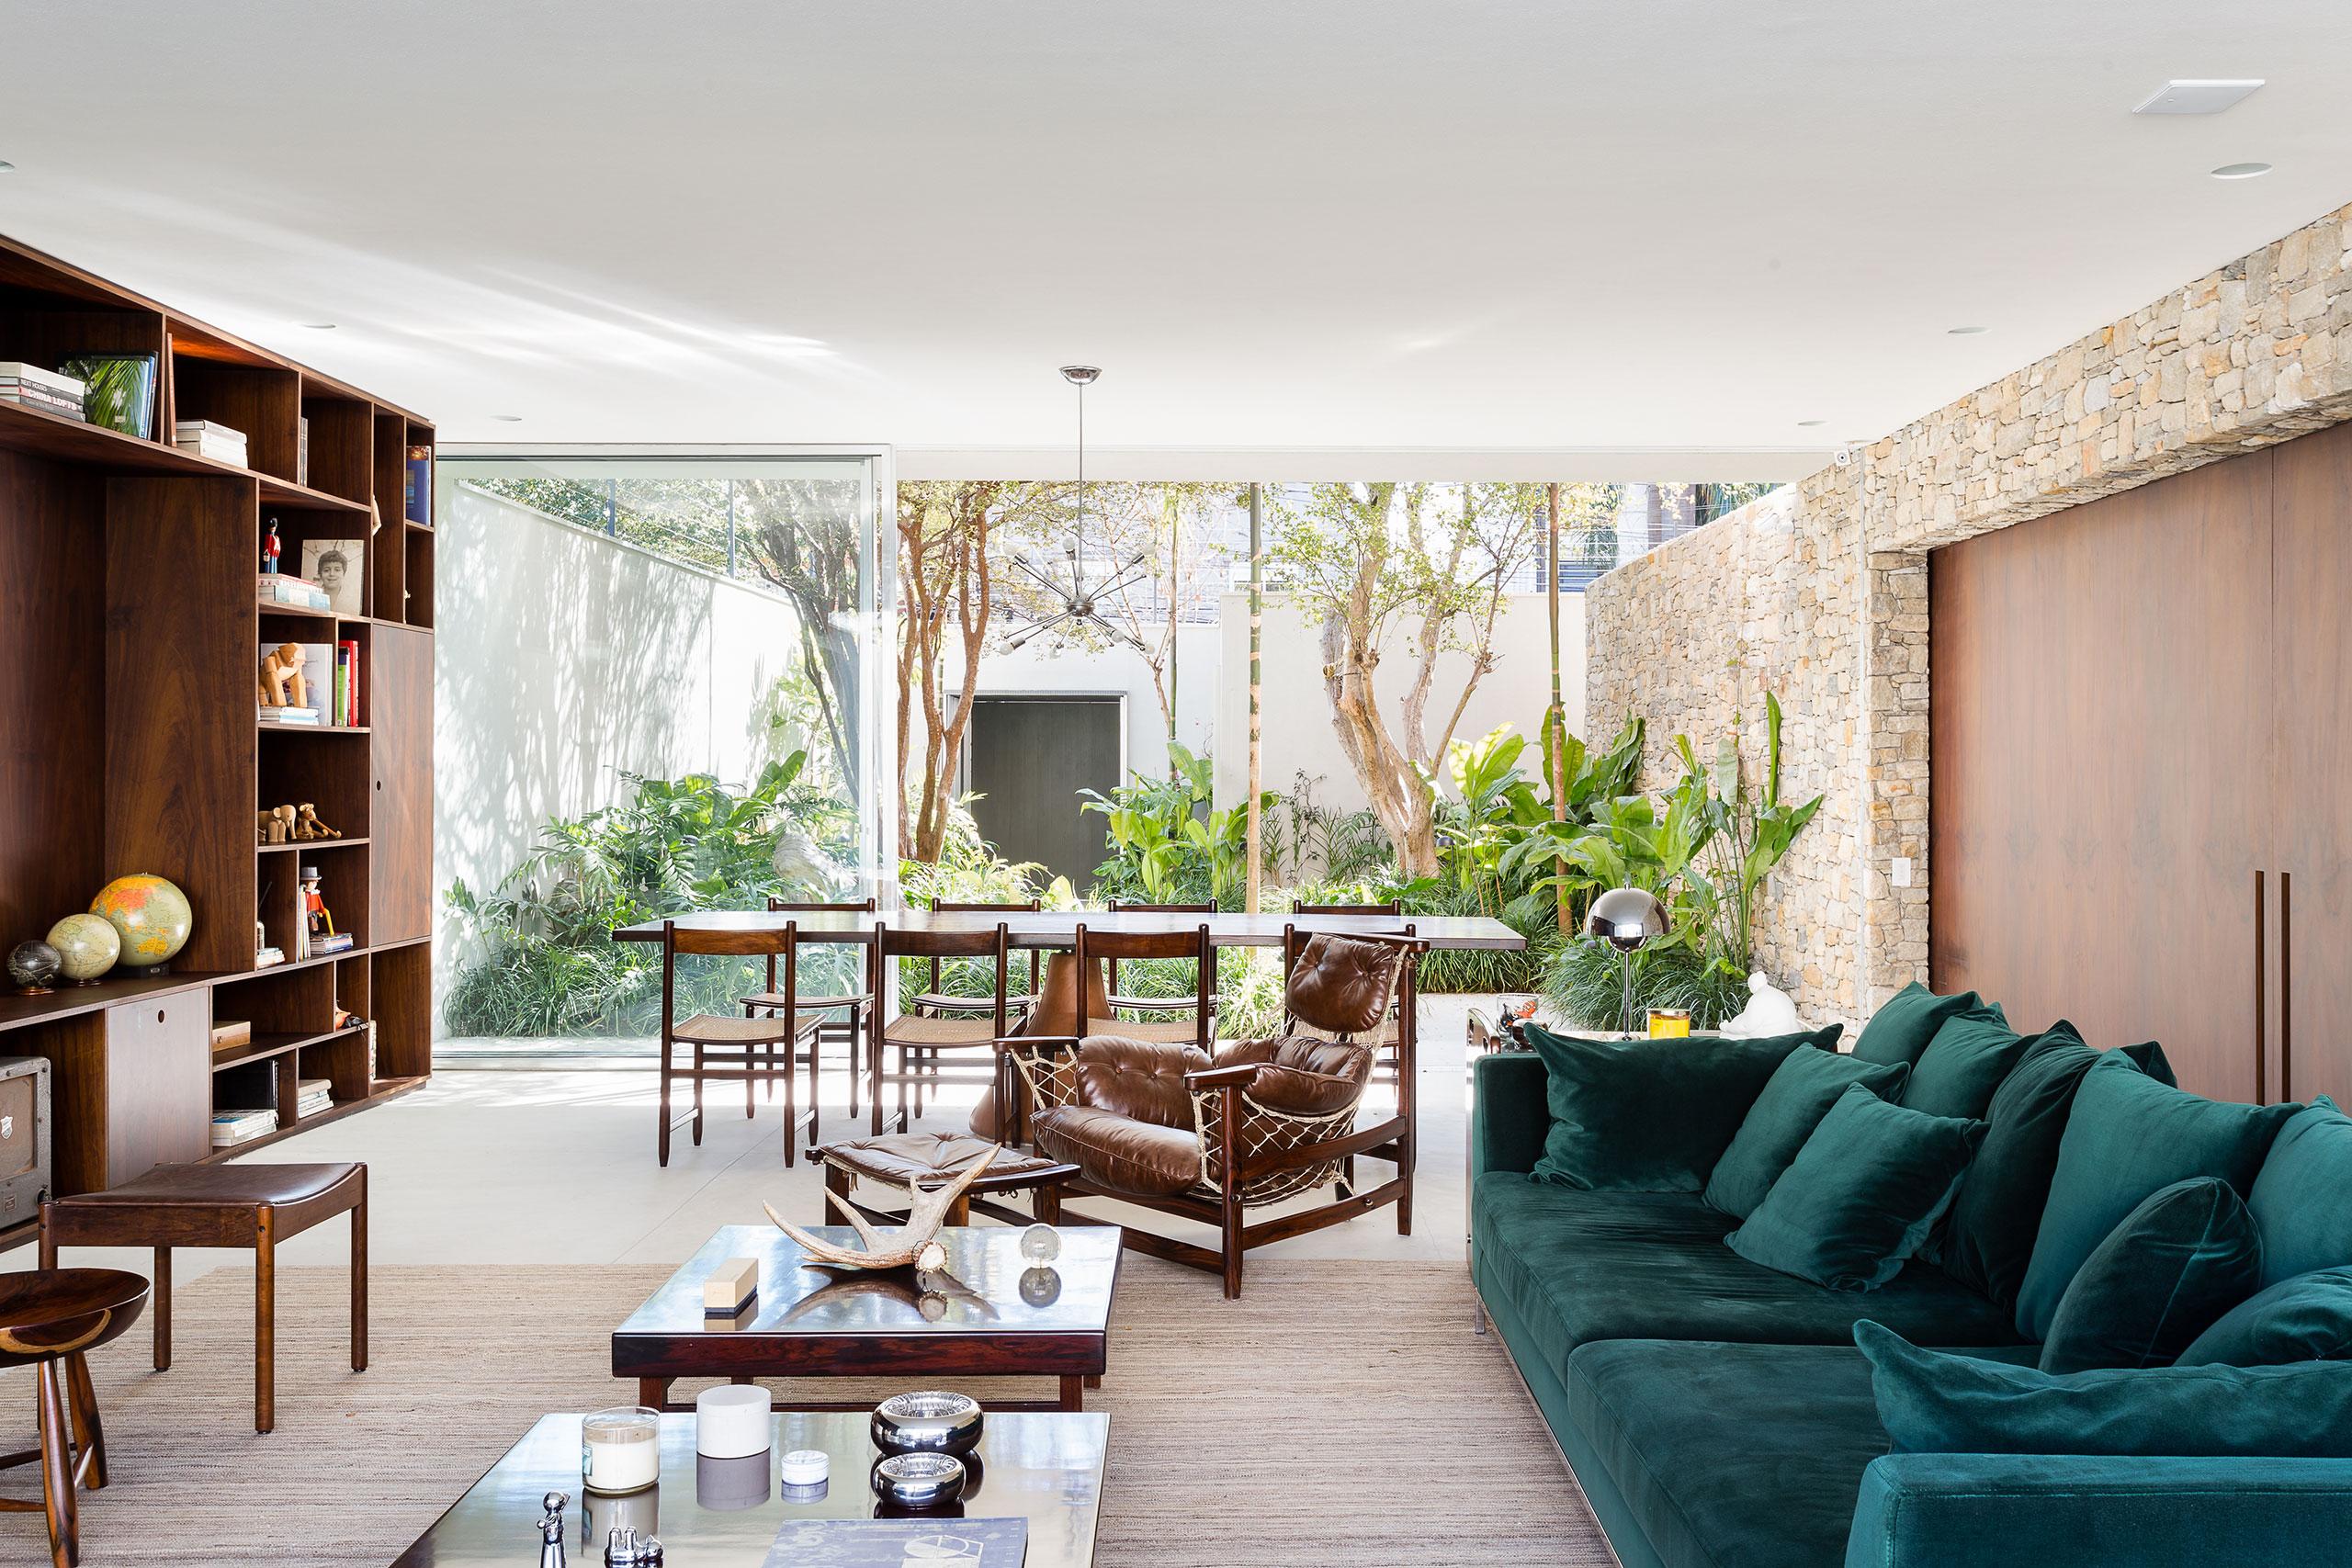 casa lara by felipe hess8 Lara House in Brasil by Felipe Hess